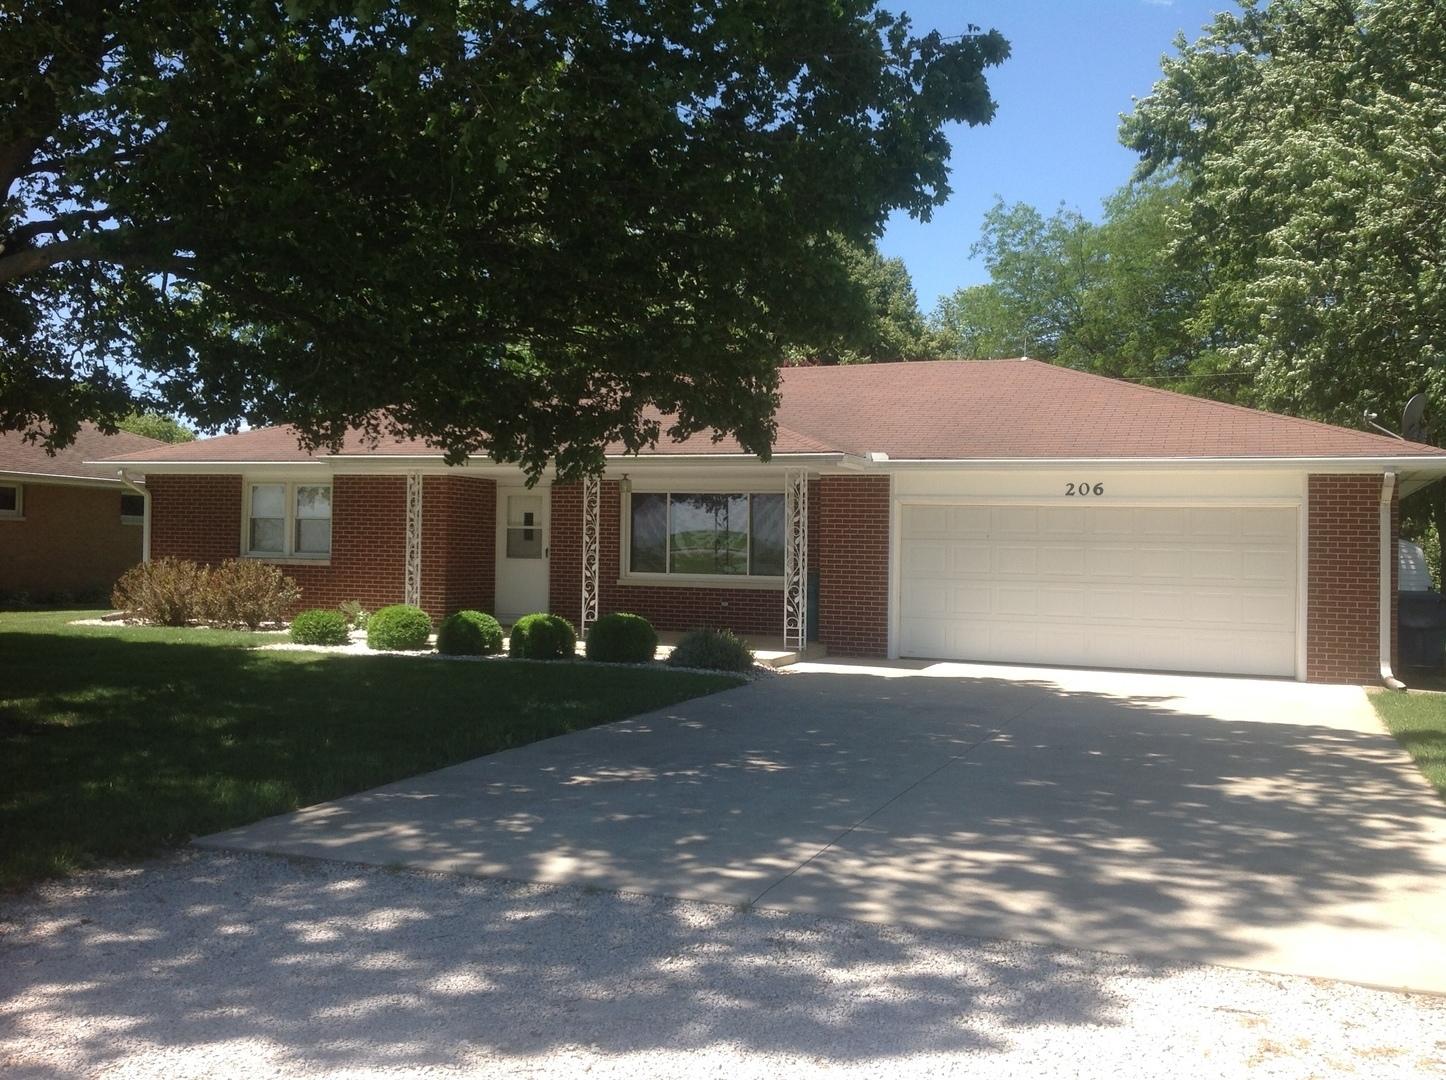 Illinois champaign county thomasboro - Thomasboro Il 61878 3 Beds 2 Baths 114 900 1 264 Sq Ft